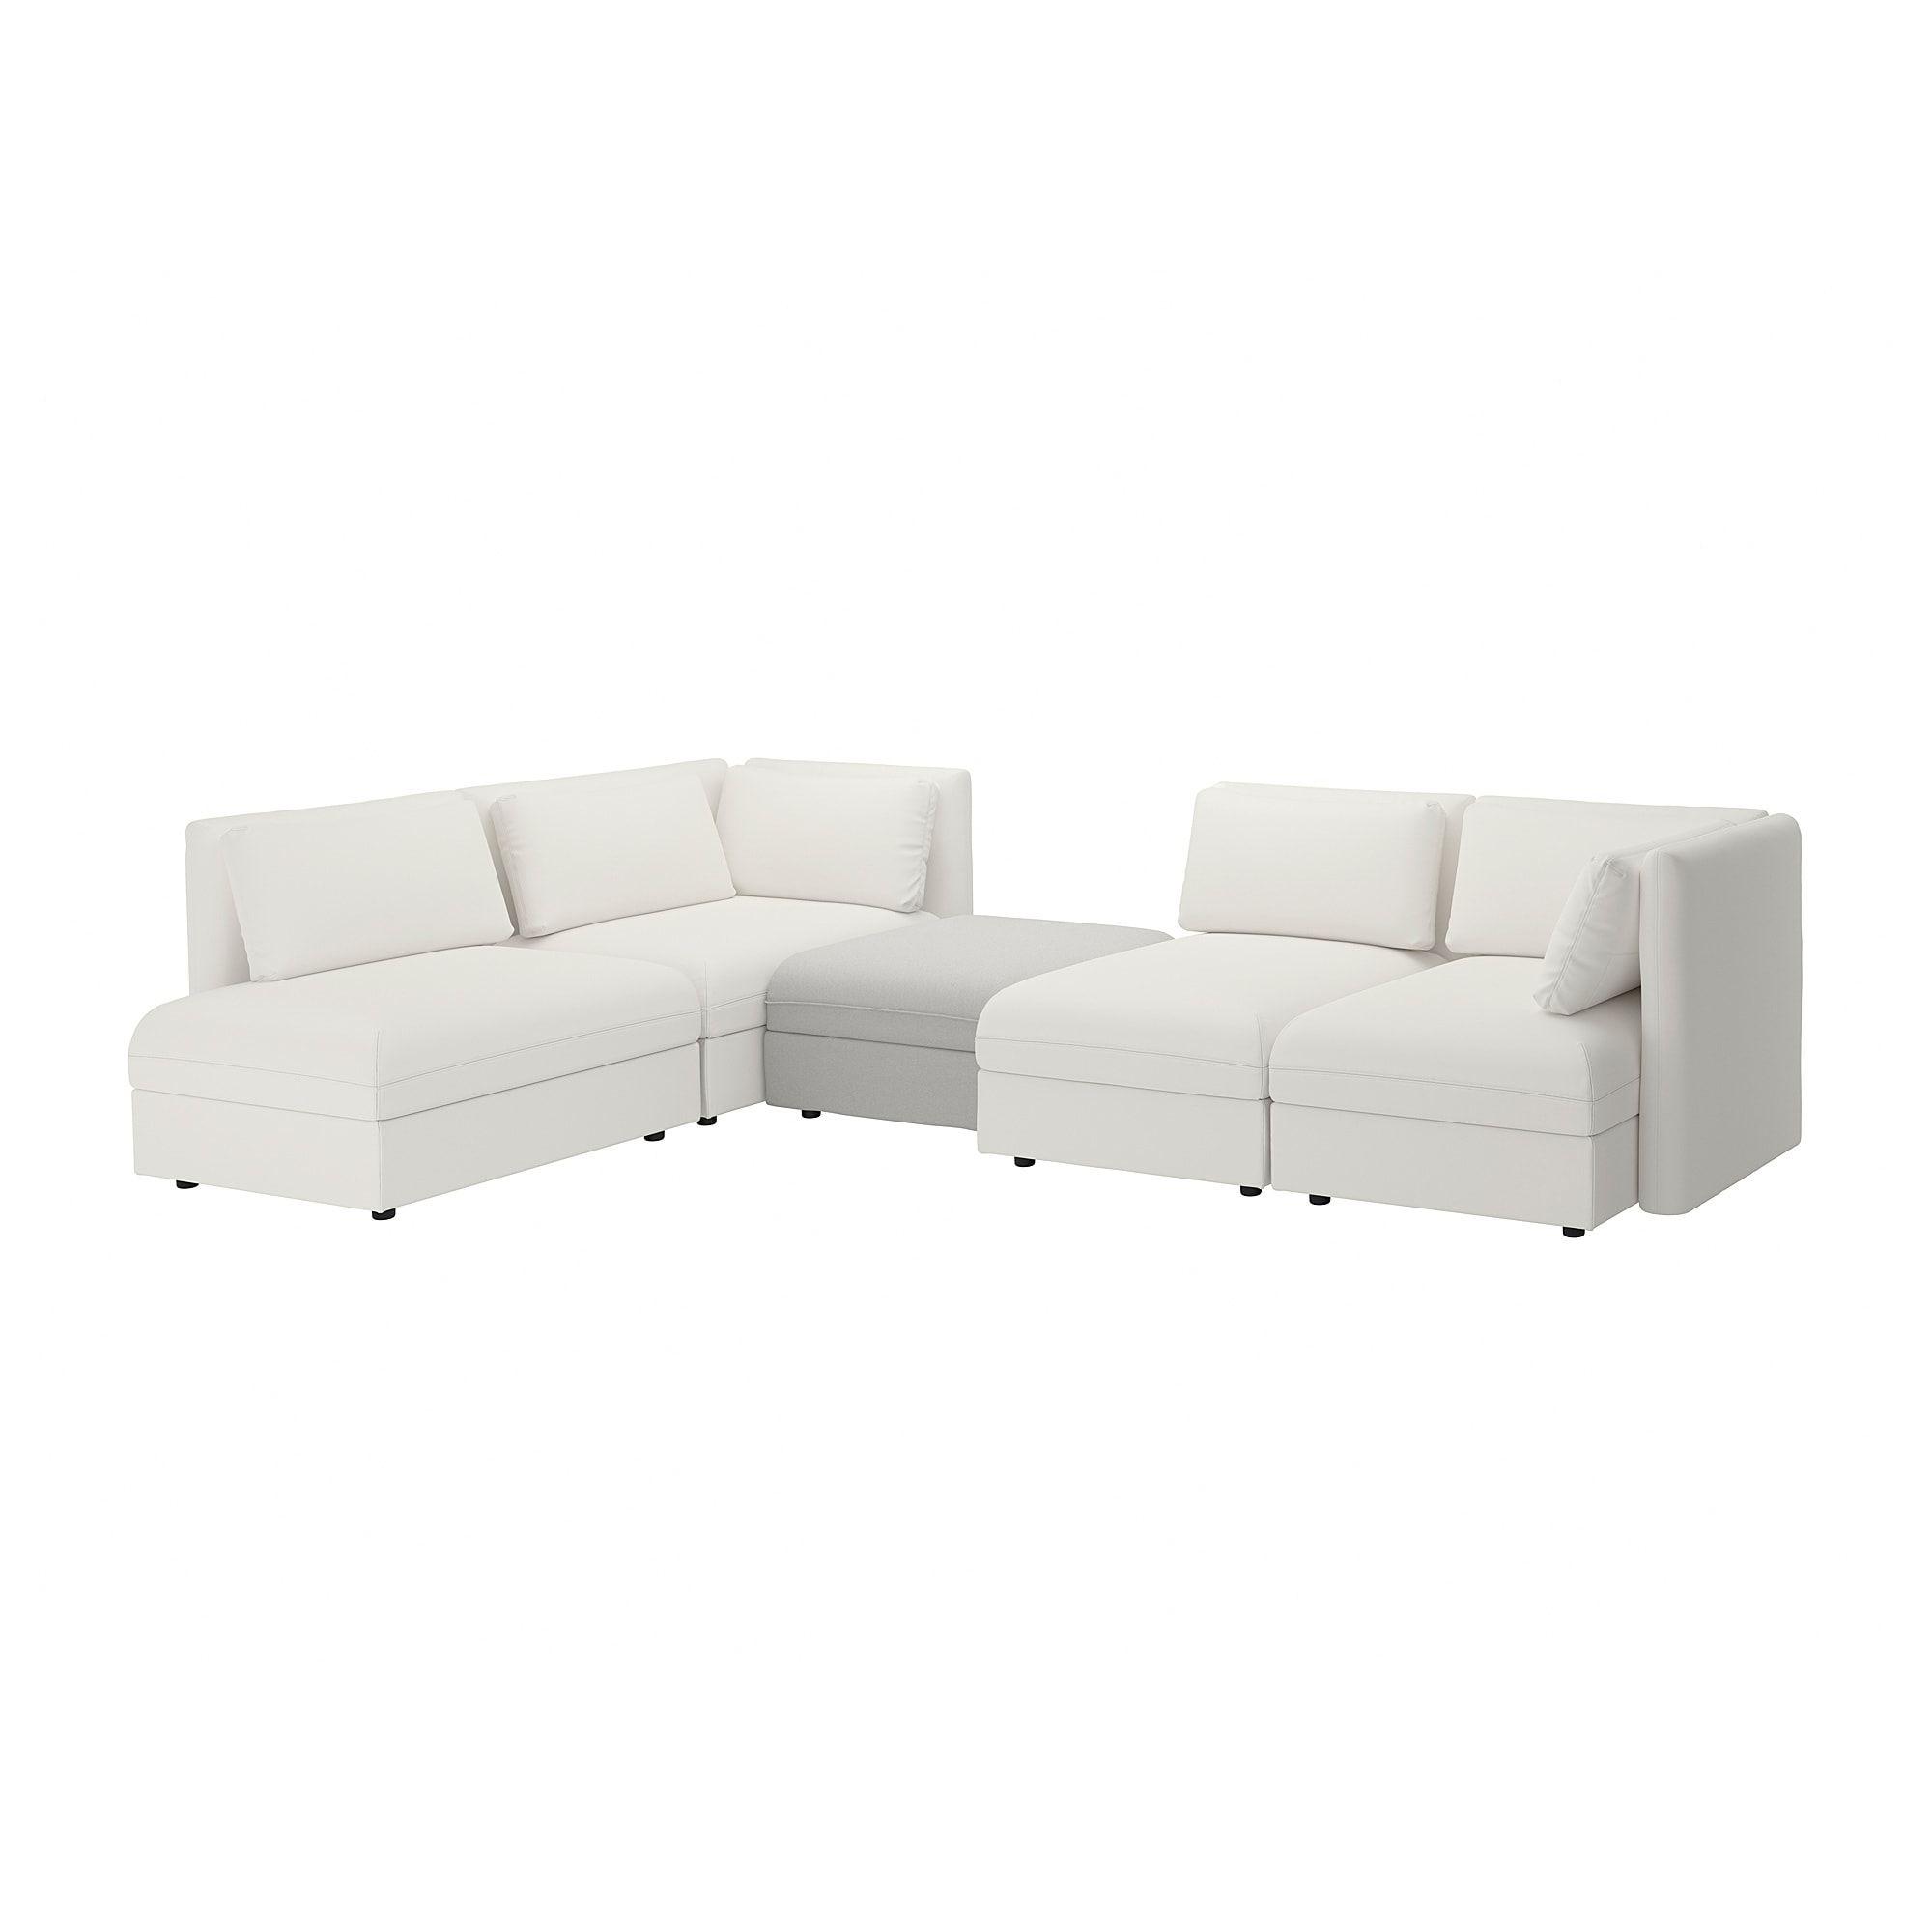 Modular Corner Sofa 4 Seat Vallentuna With Storage Murum